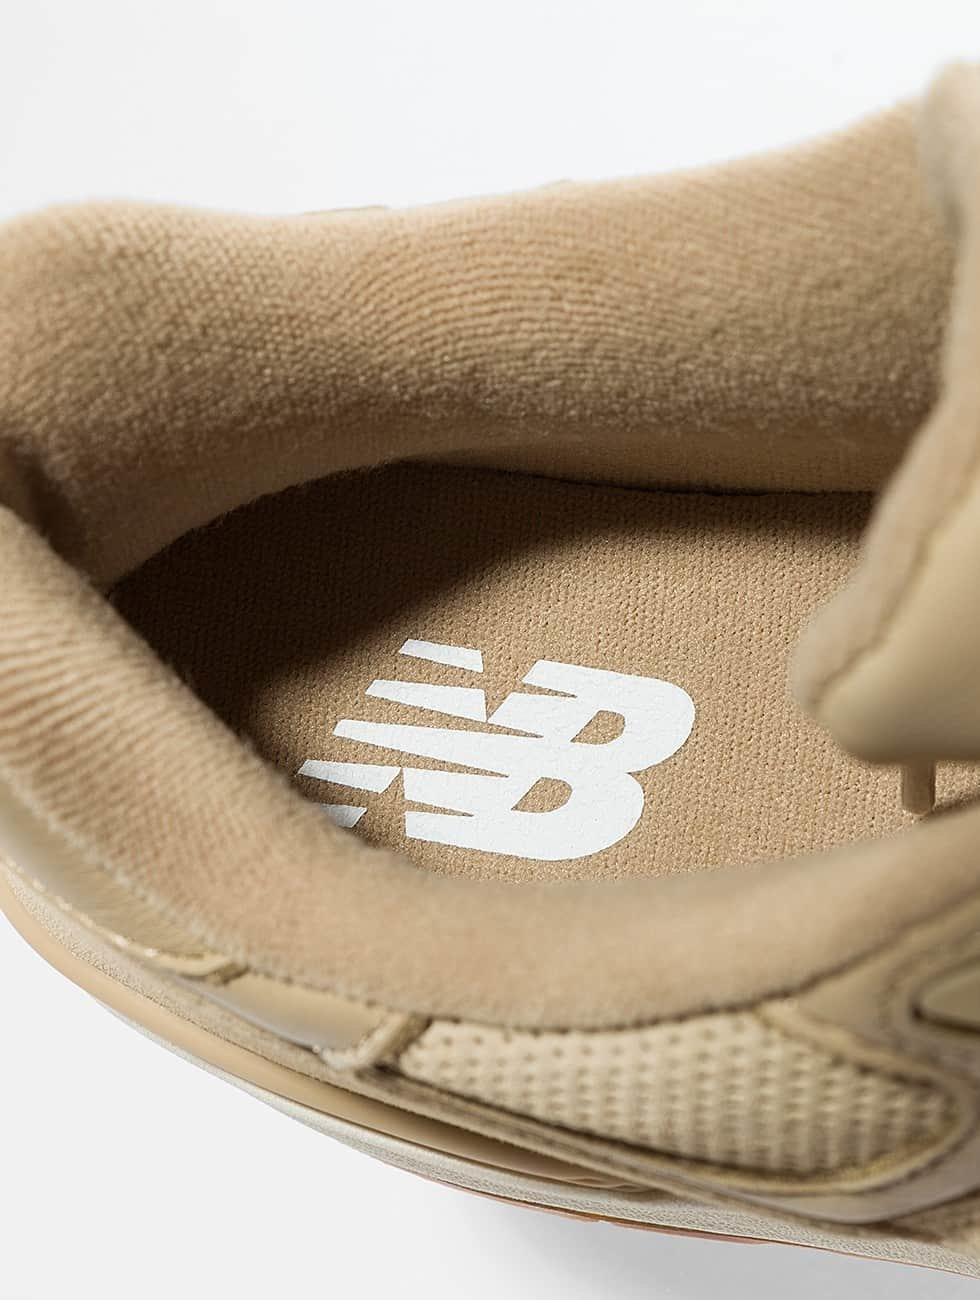 Nuovo Equilibrio Schoen / Sneaker Ml 597 Skh A Bruin 360.721 n5CyU70gZ